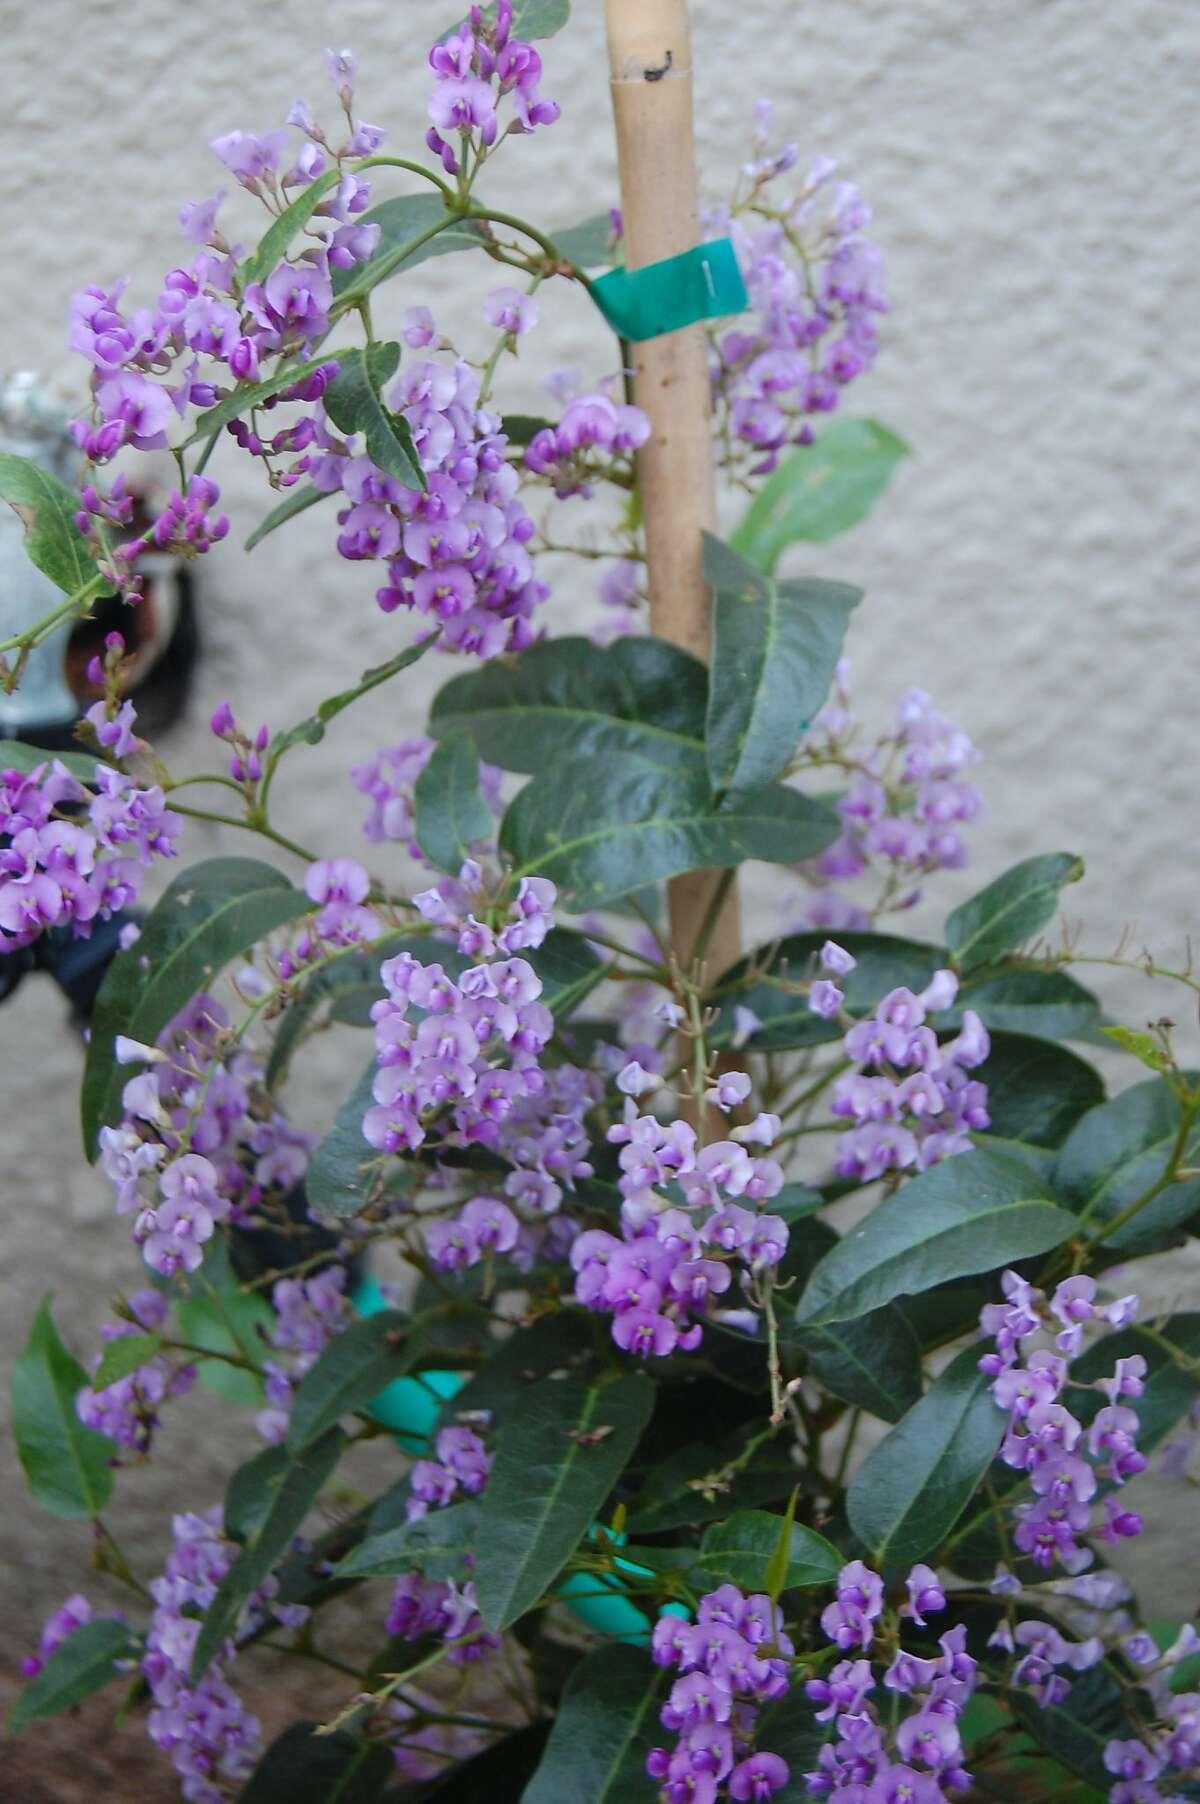 Hardenbergia violacea. Photo: Earl Nickel